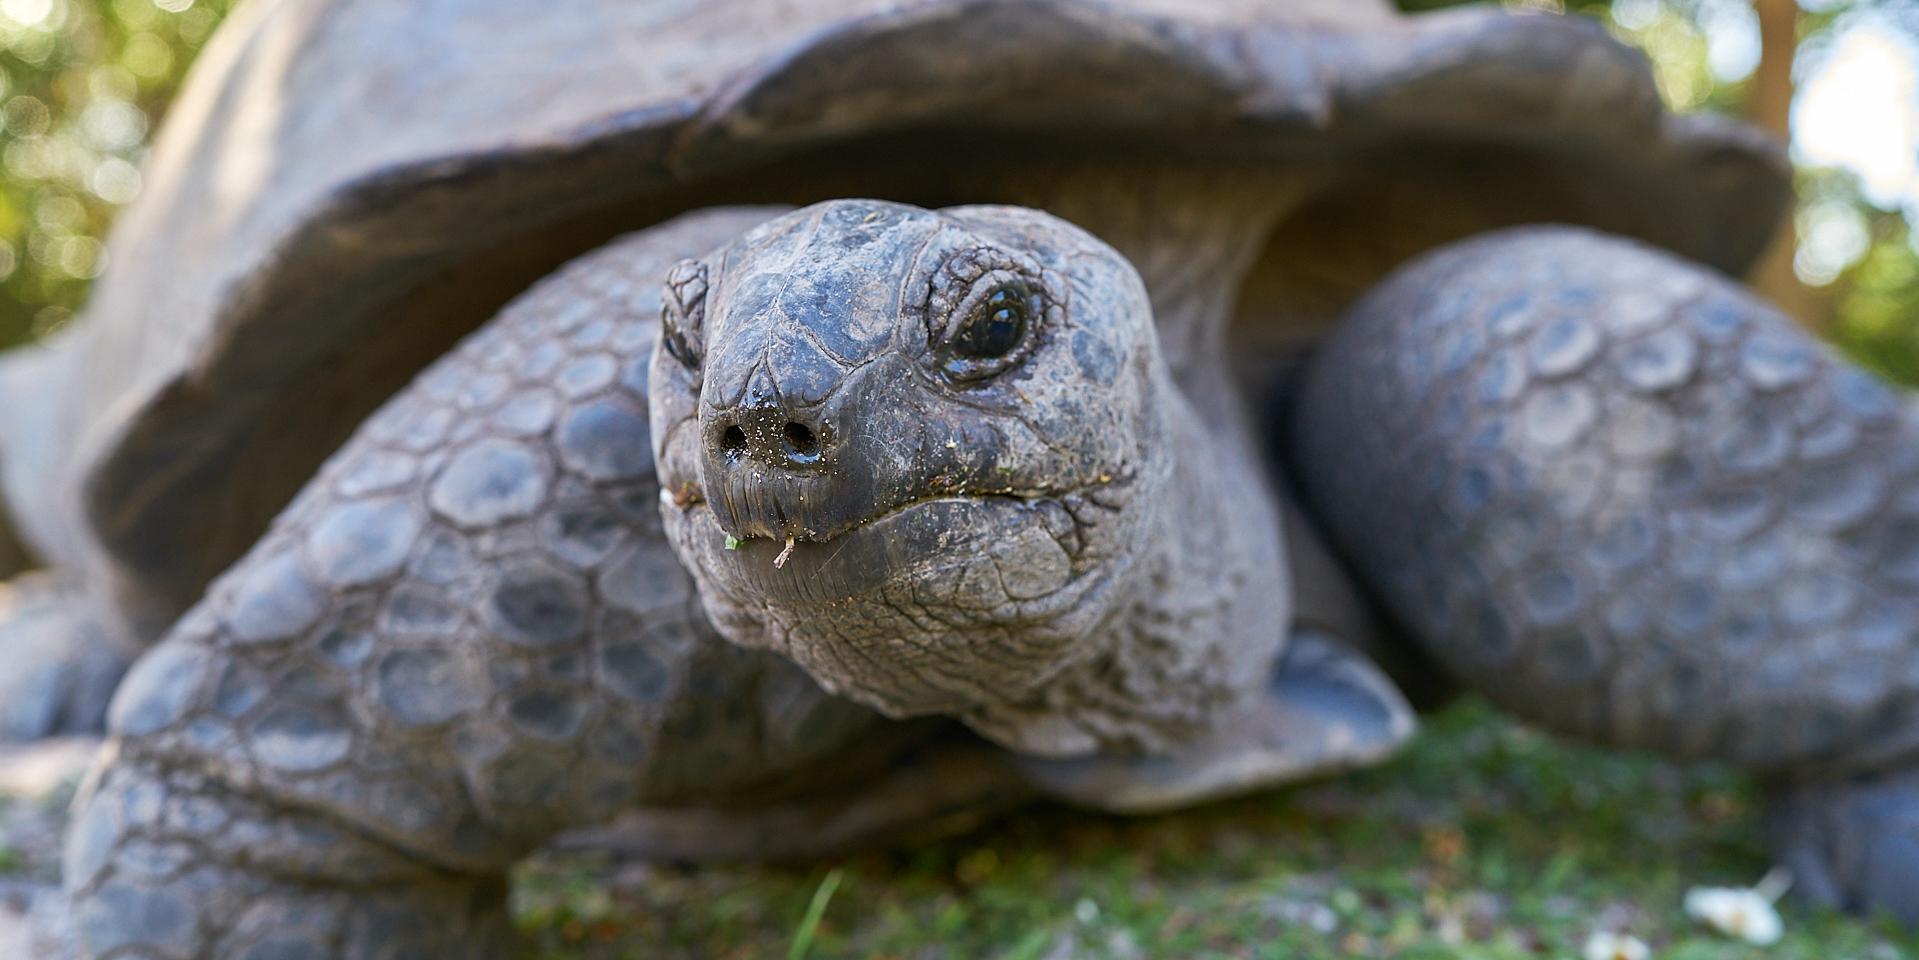 A Seychelles giant tortoise sticks out its long neck.